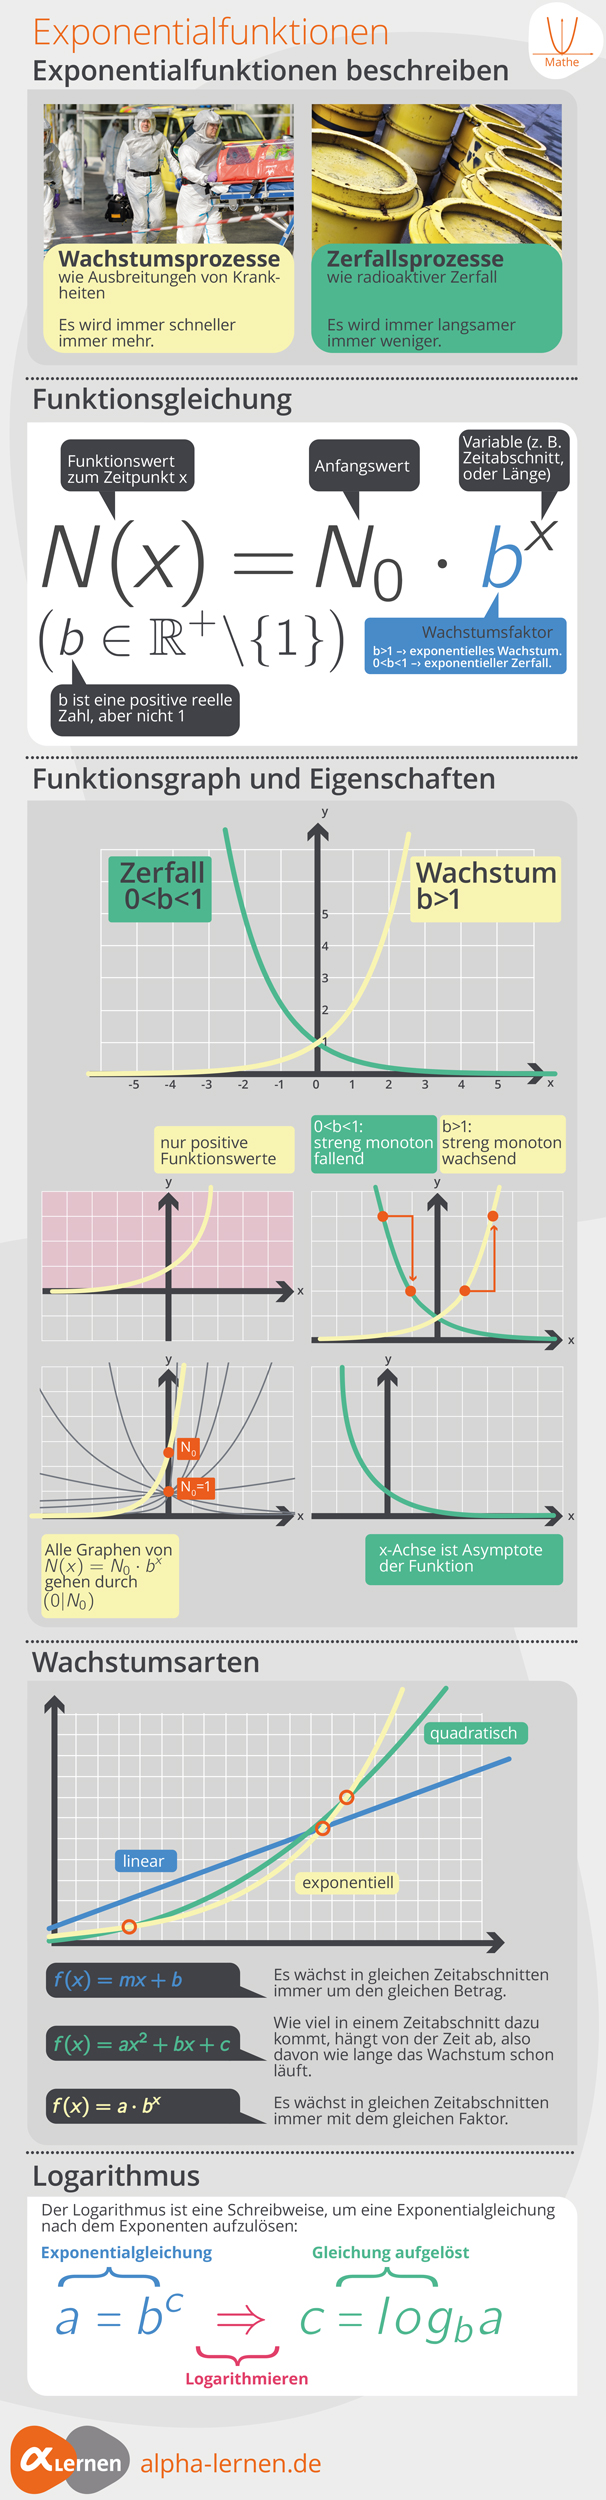 mathe spickzettel exponentialfunktionen mathe alpha. Black Bedroom Furniture Sets. Home Design Ideas